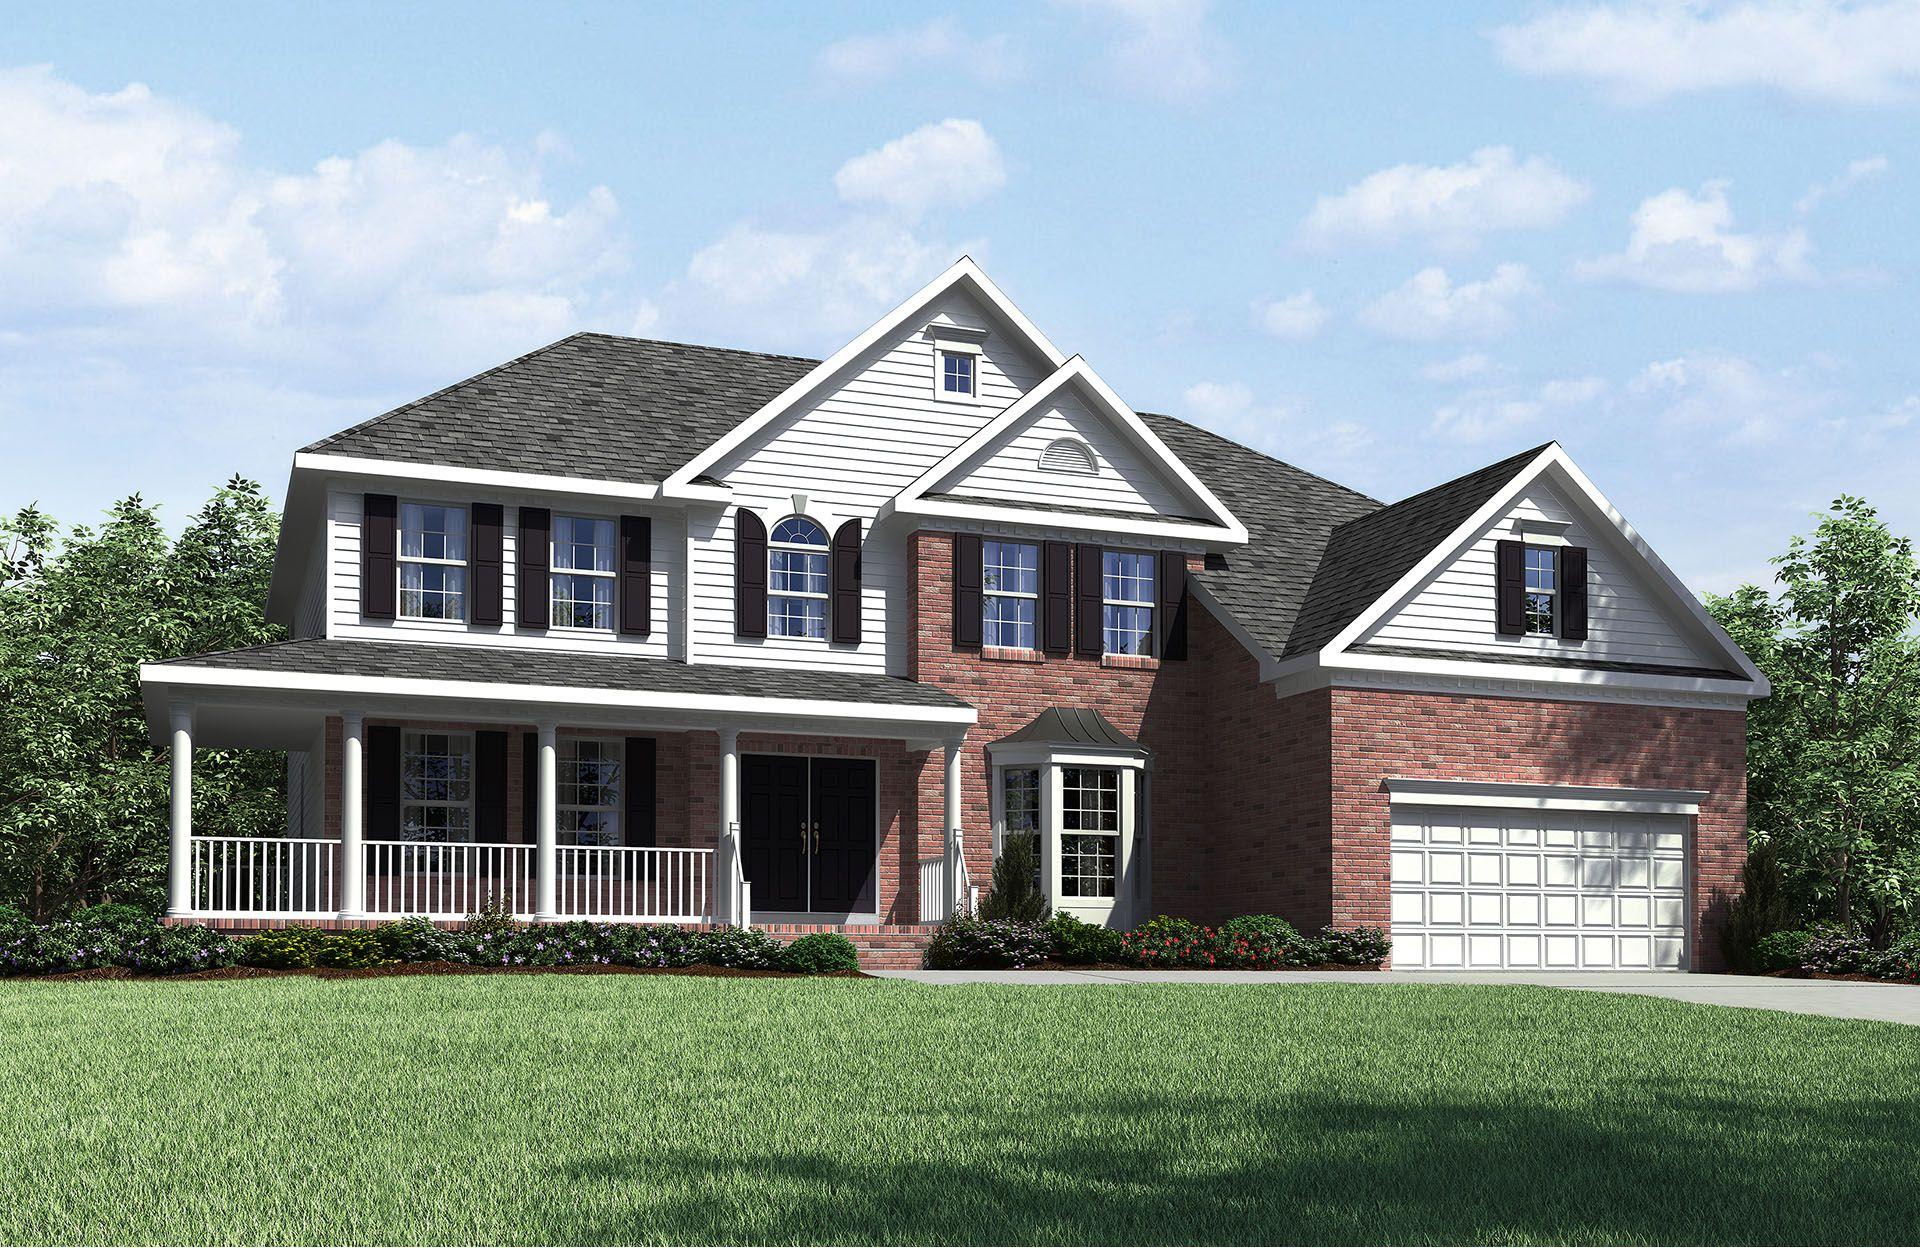 Single Family for Sale at Cabe Crossing - Langdon 2051 Greenbrook Lane Durham, North Carolina 27705 United States